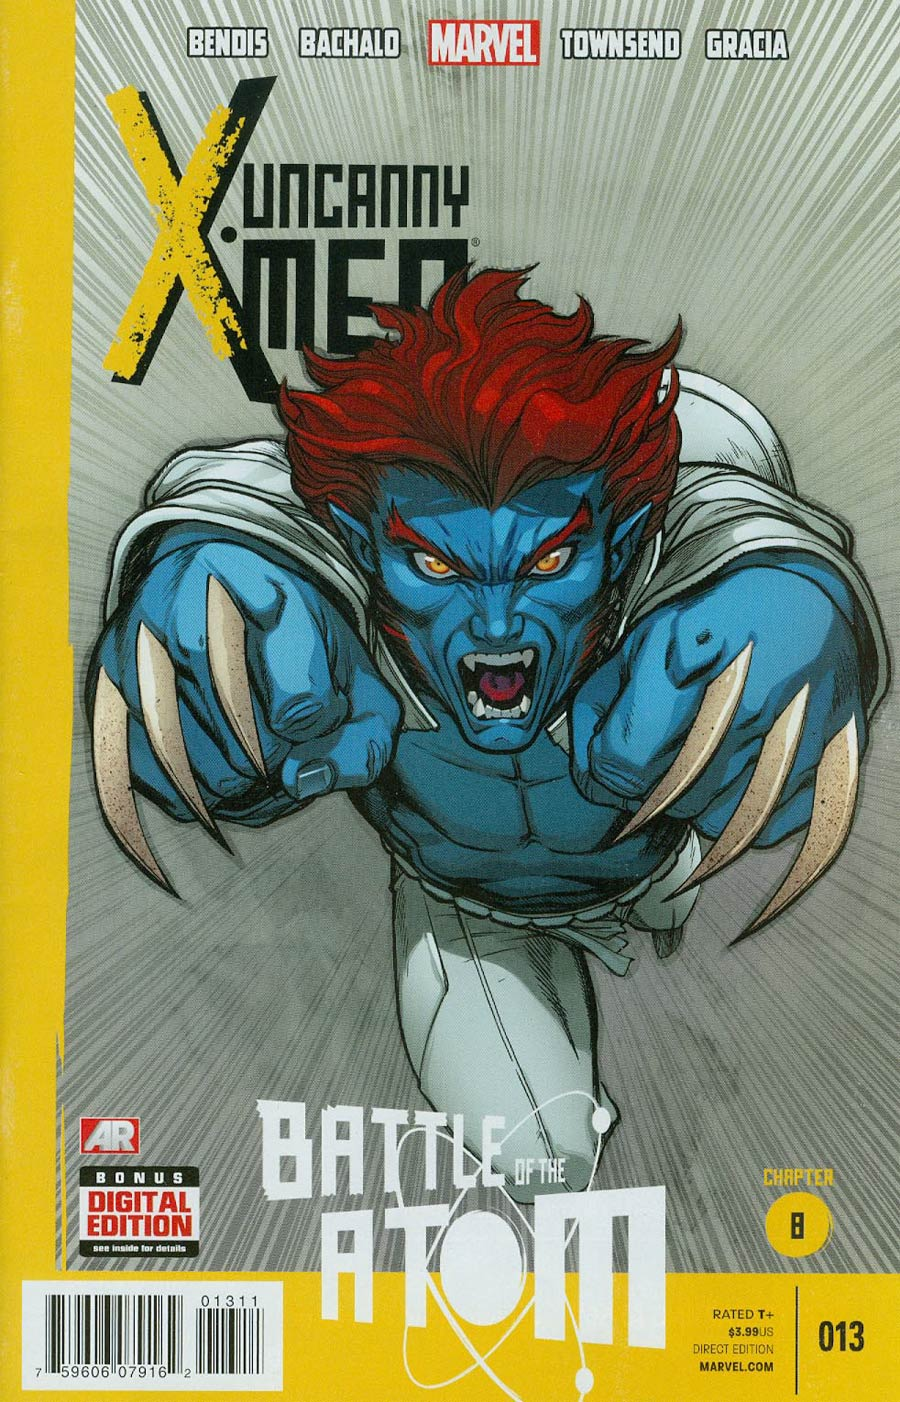 Uncanny X-Men Vol 3 #13 Cover A Regular Ed McGuinness Cover (Battle Of The Atom Part 8)